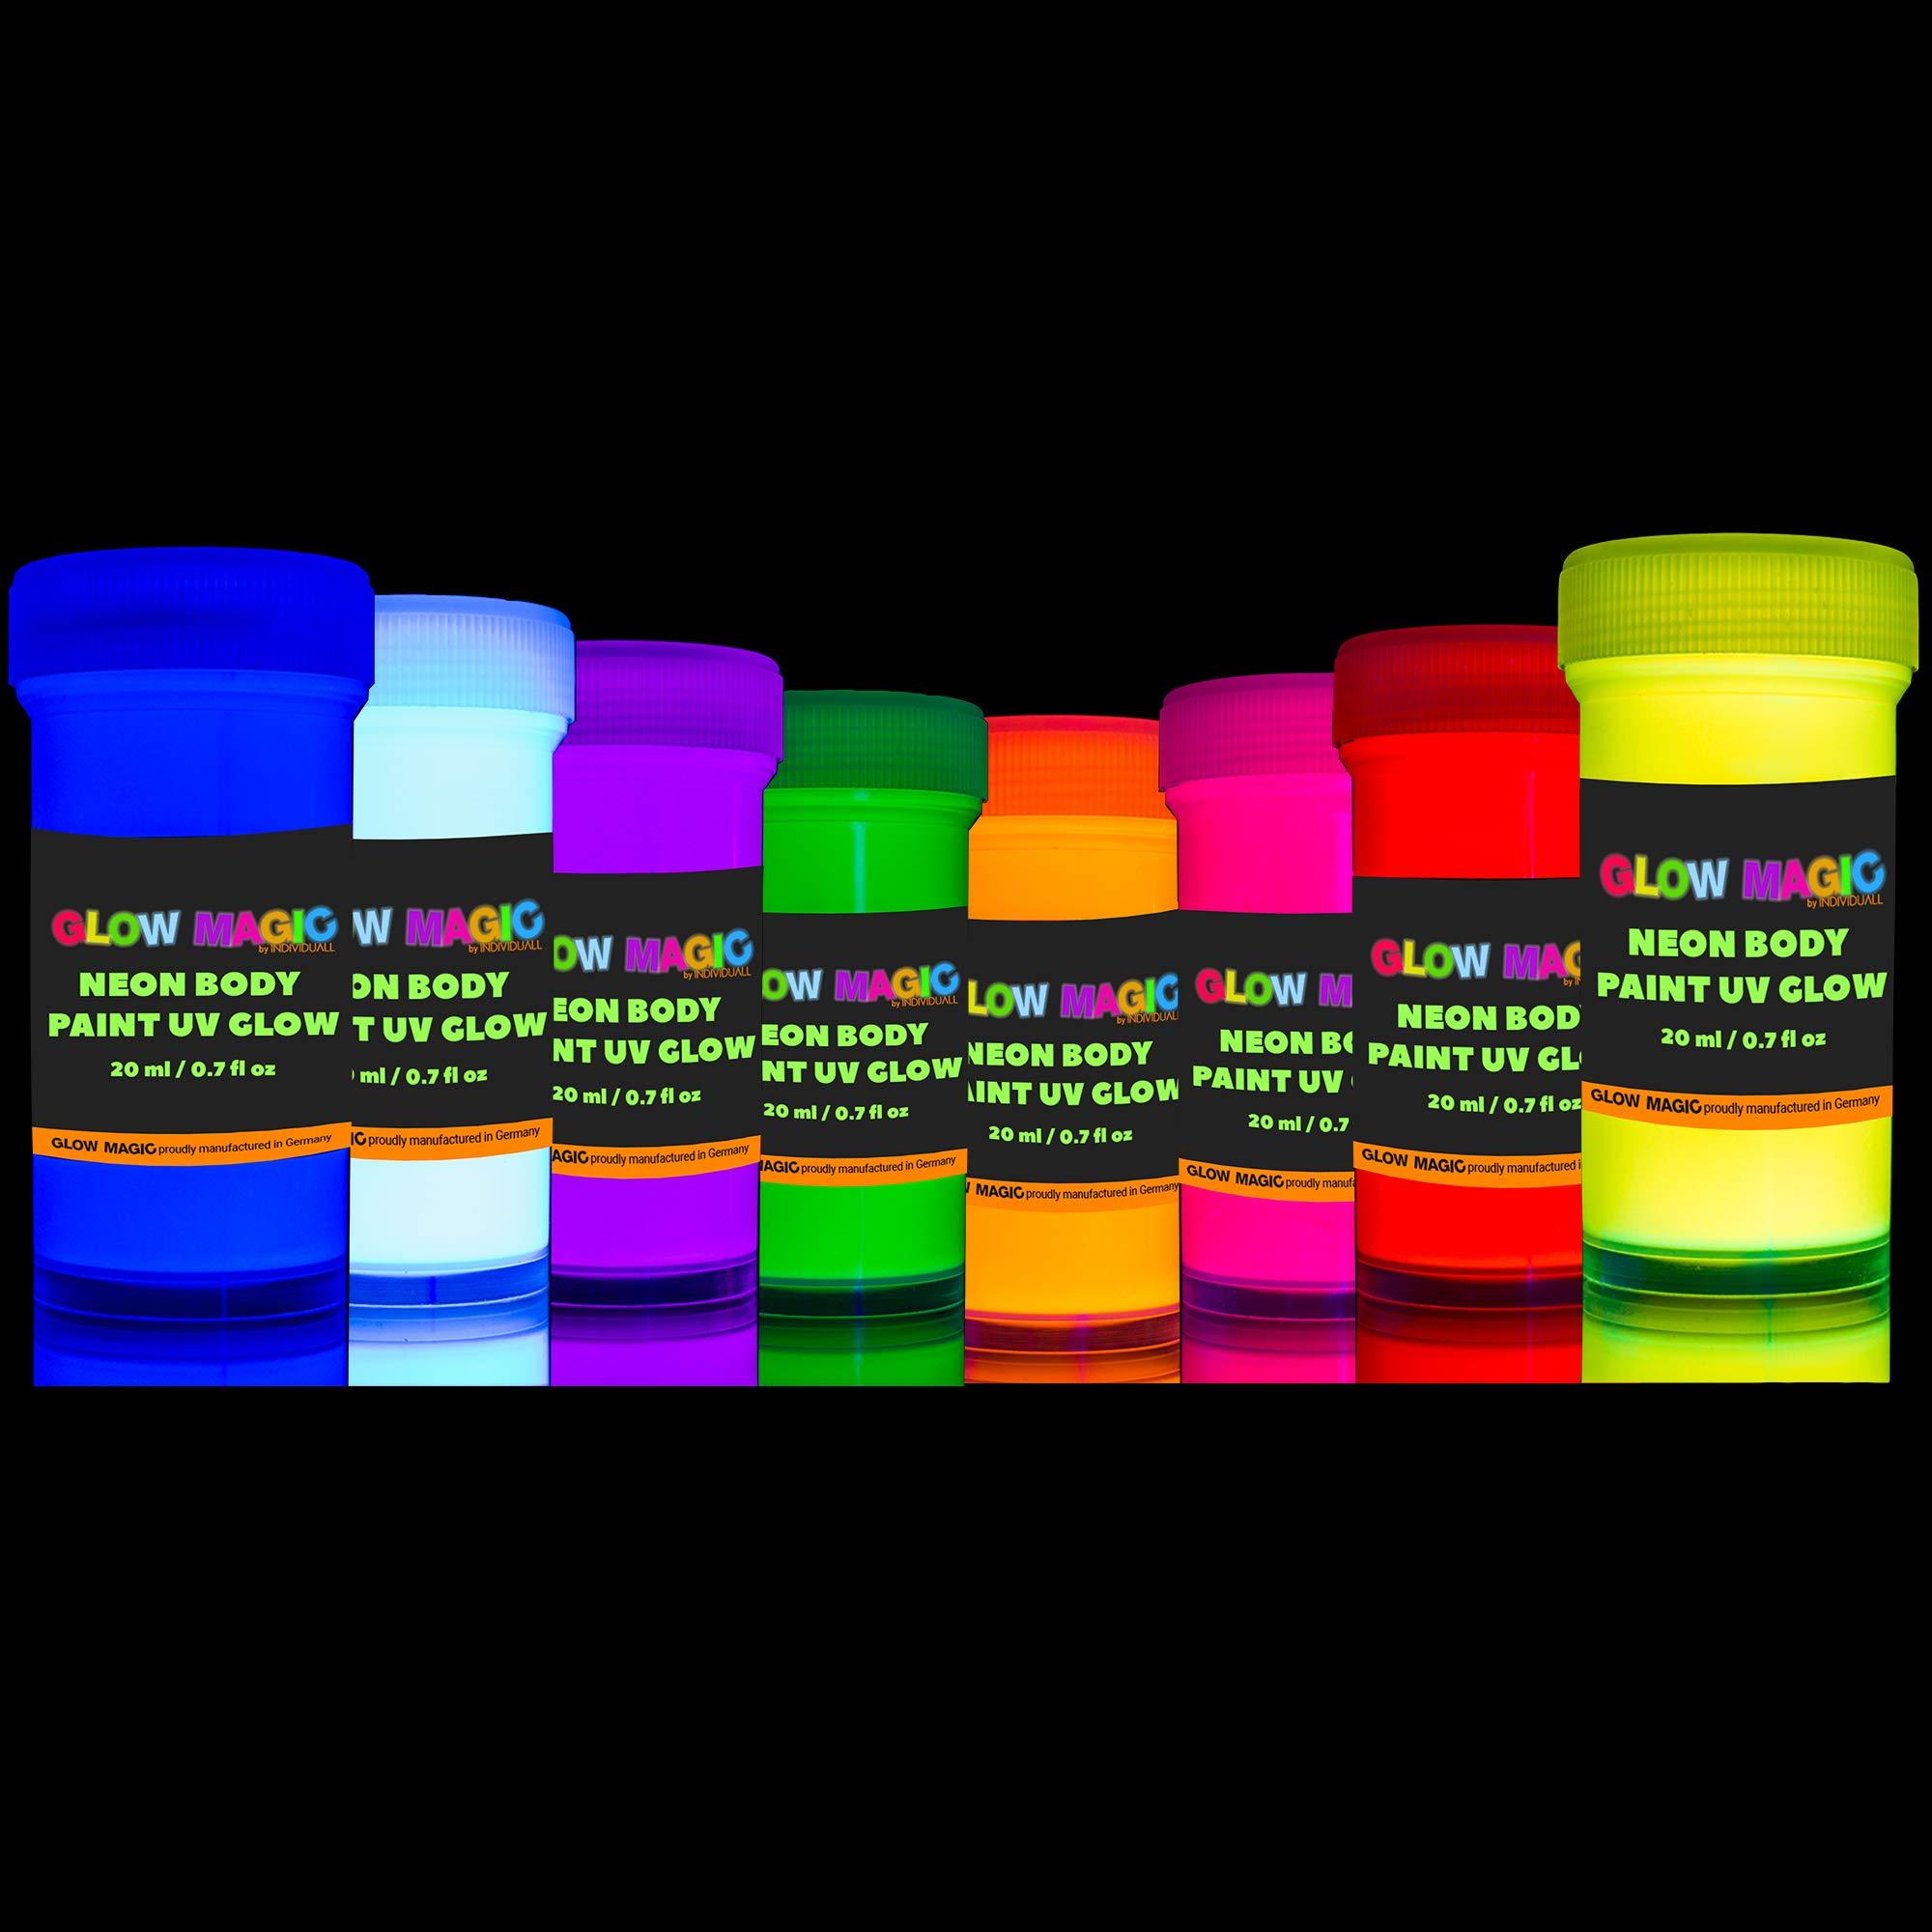 GLOW MAGIC Neon Body Paint